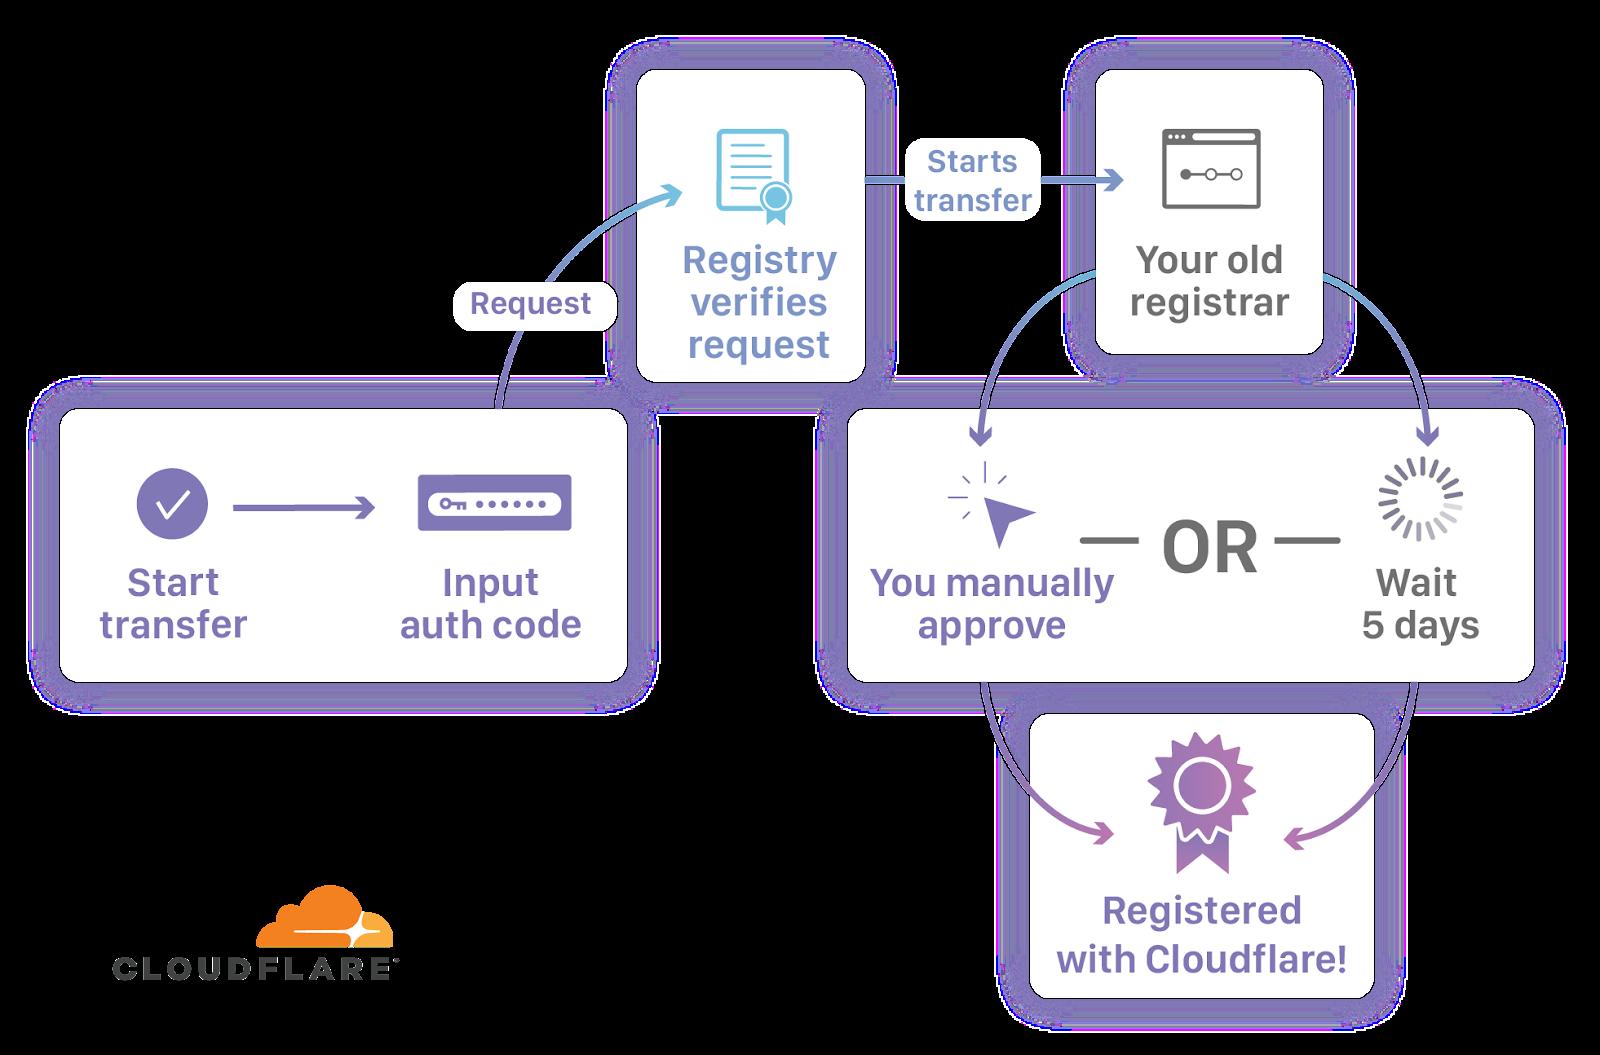 Cloudflare Registrar at three months